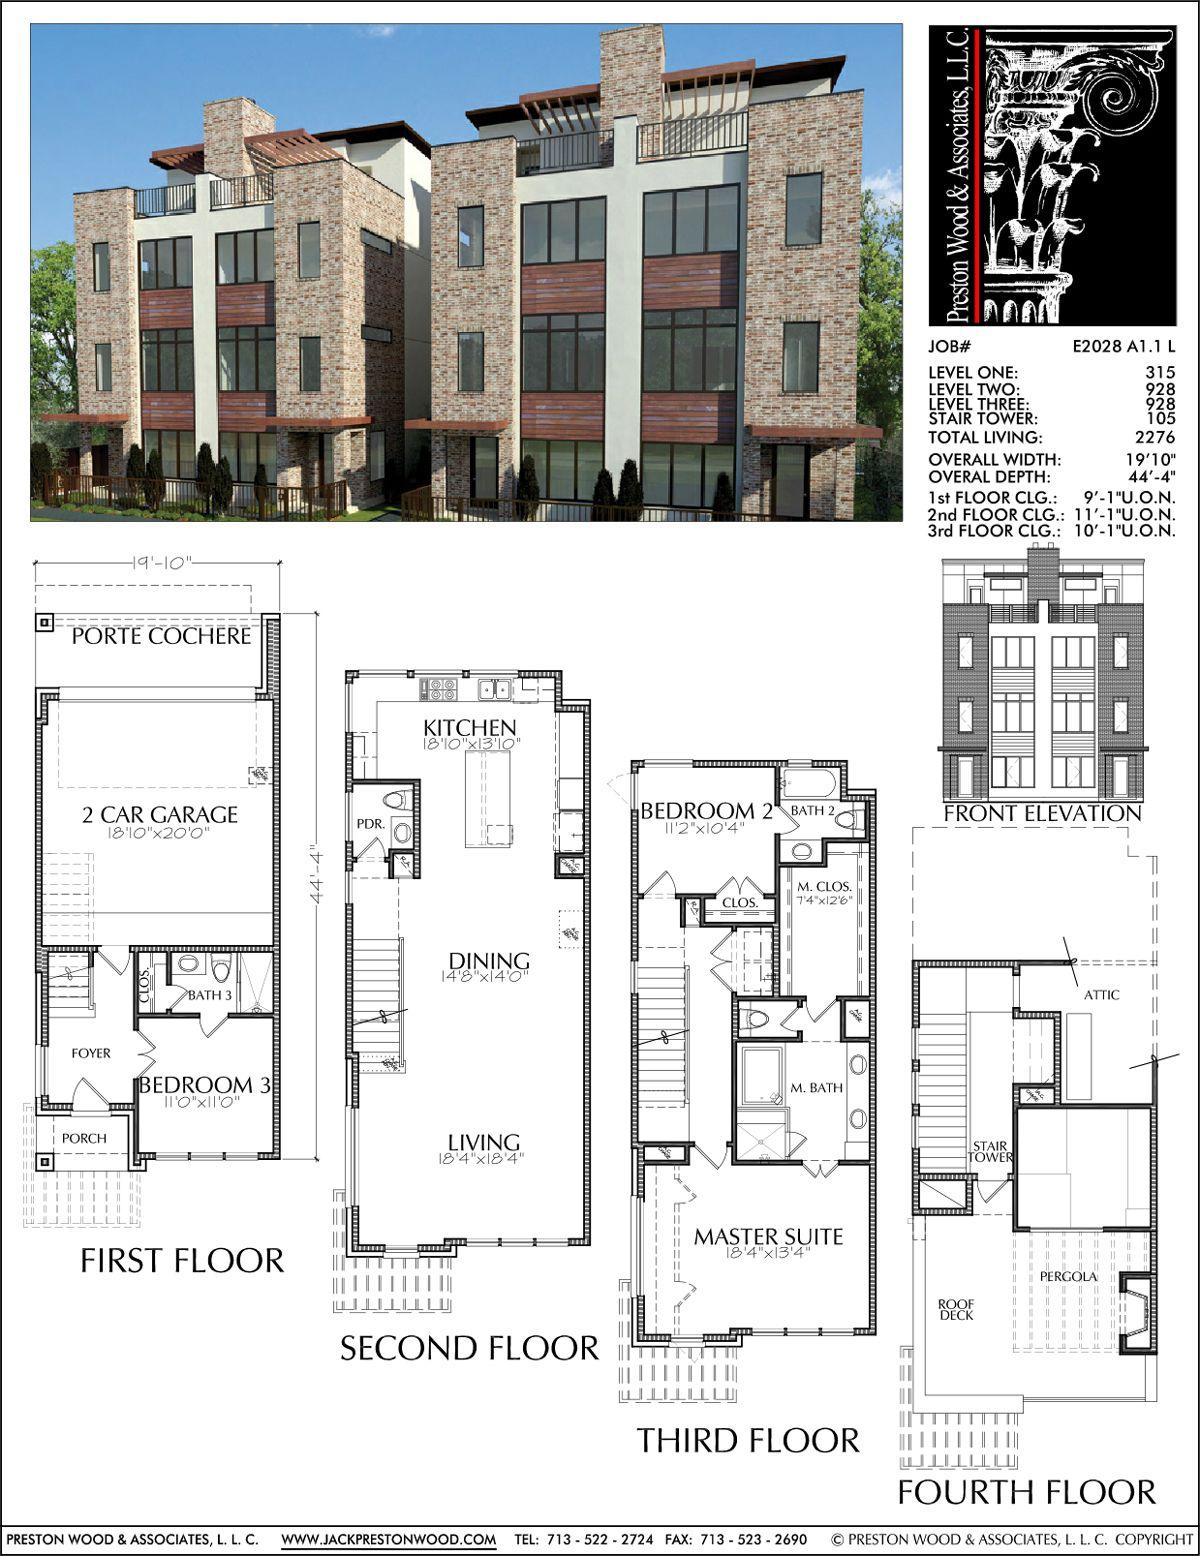 Duplex Townhome Plan E2028 A1 1